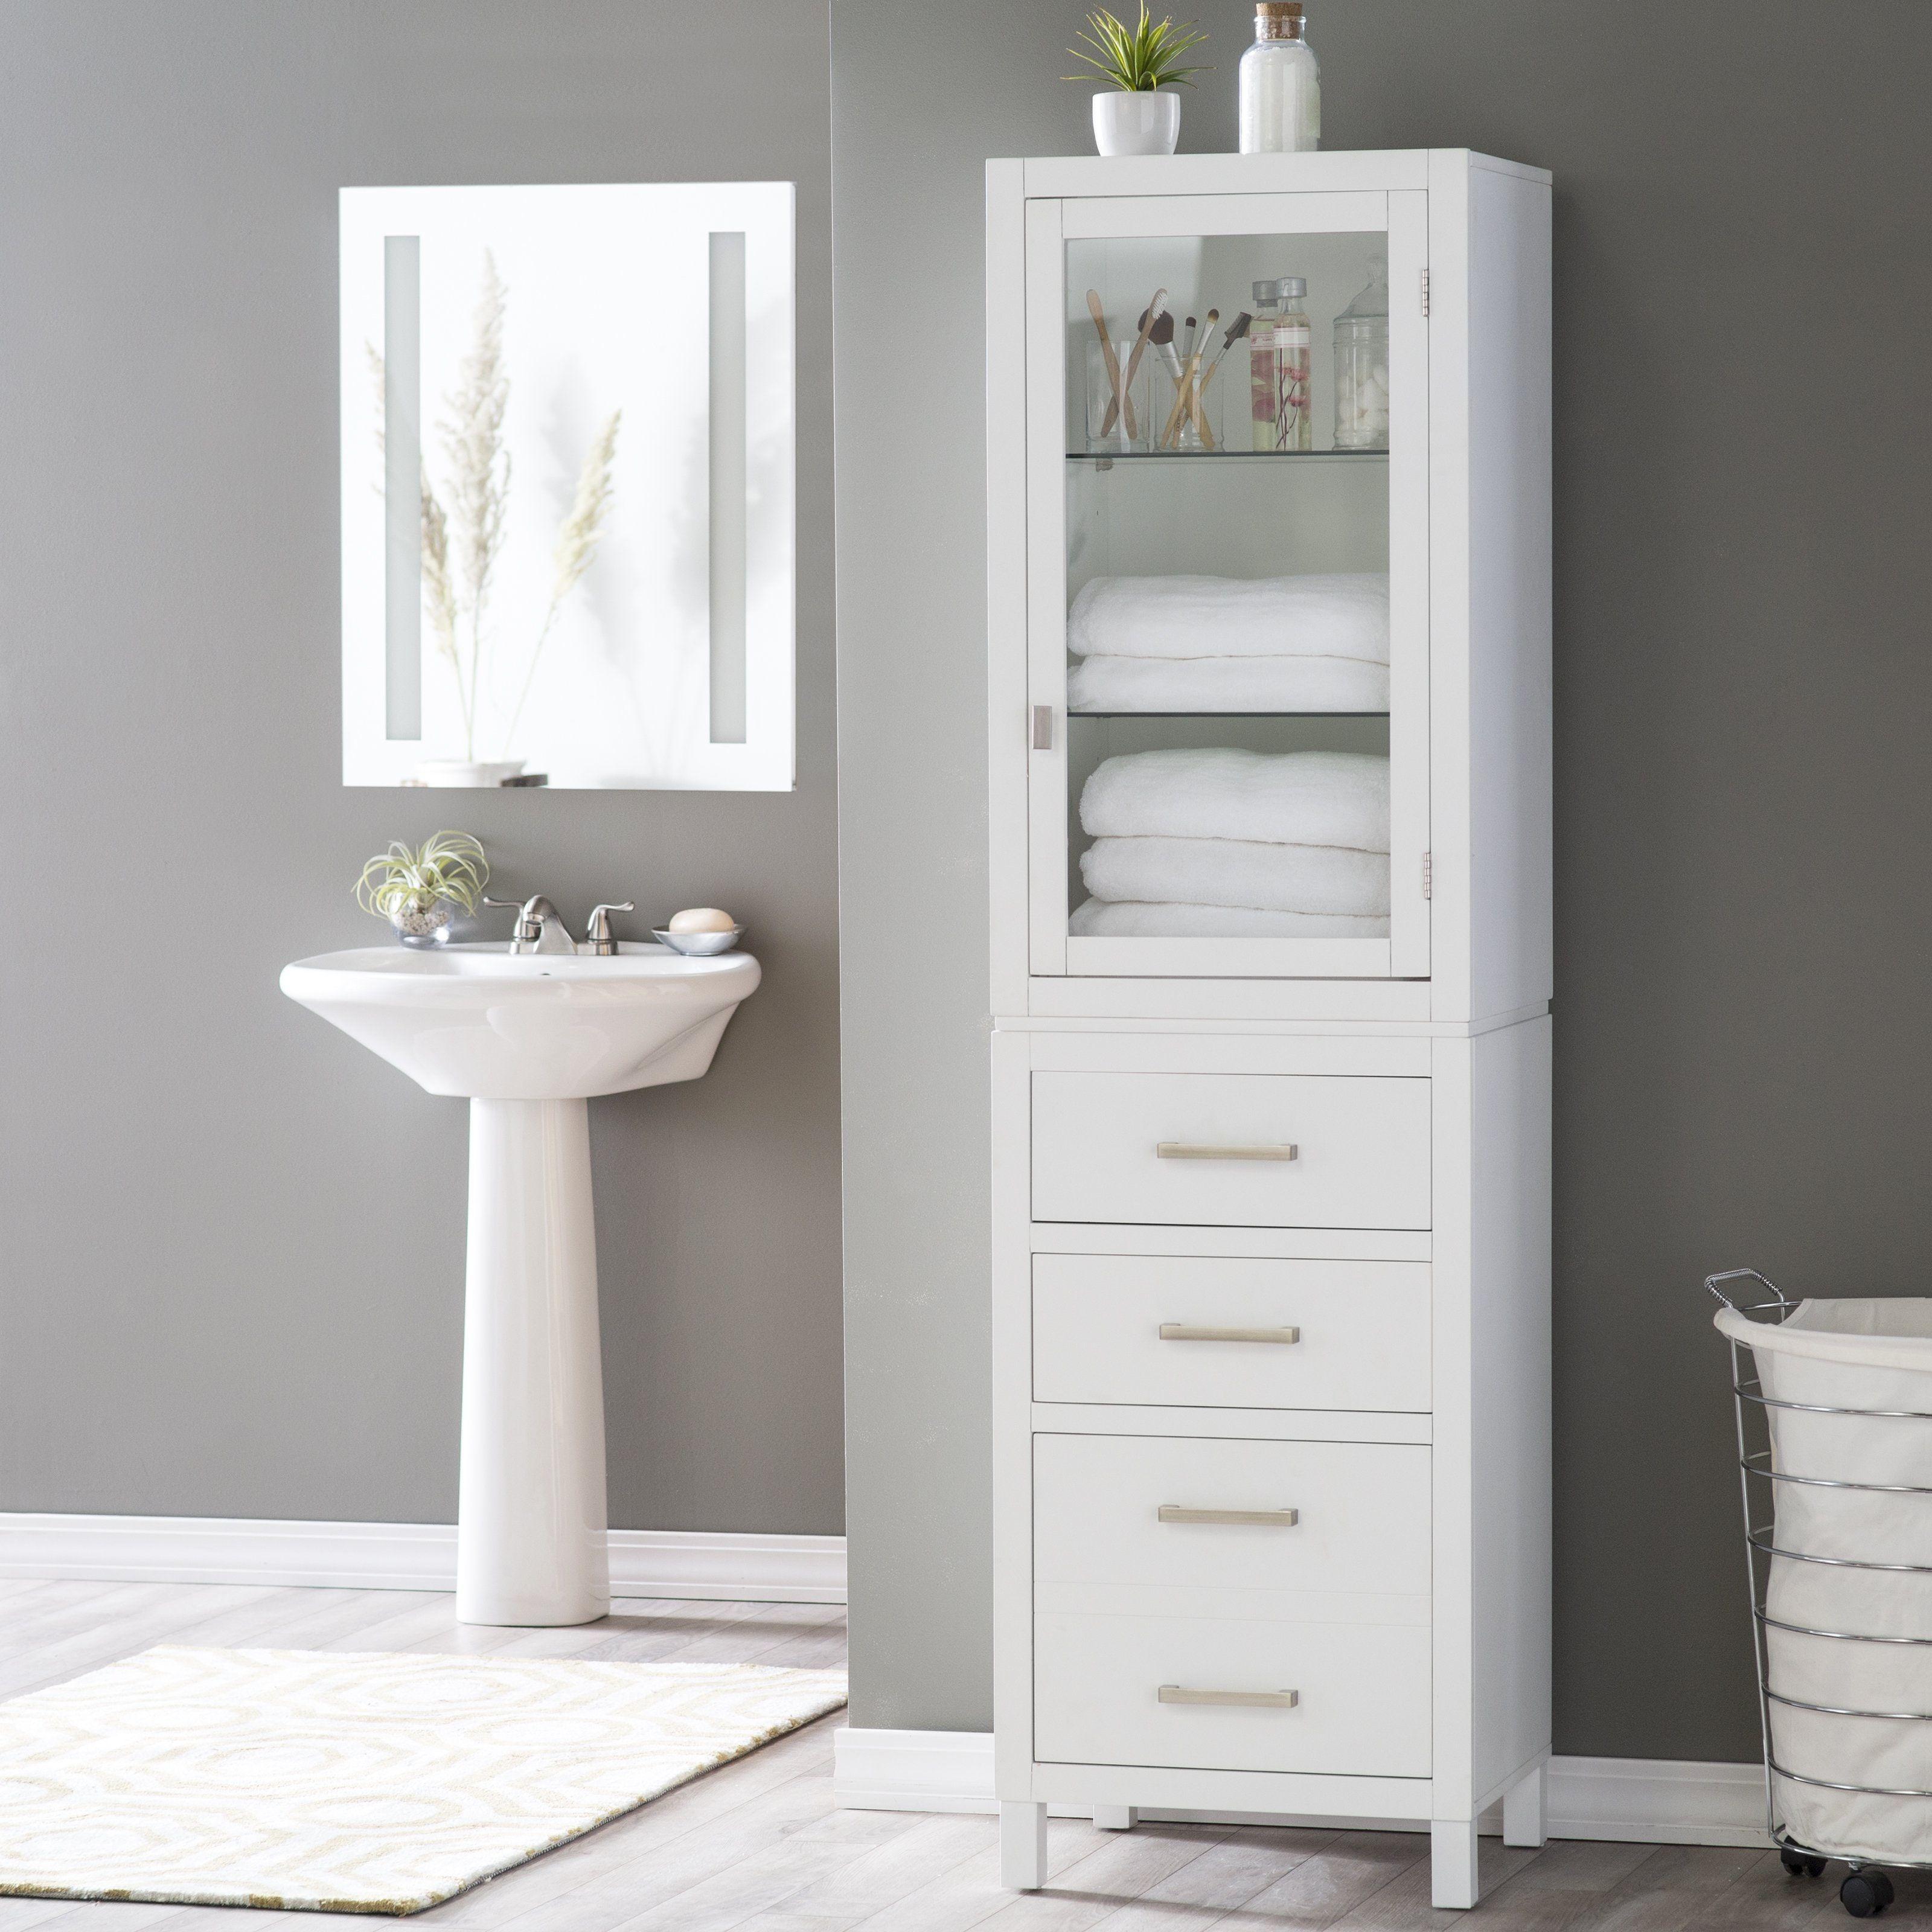 Free Standing Linen Cabinets For Bathroom Image Result For Modern Freestanding Linen Closet Tall Bathroom Storage Bathroom Floor Cabinets Linen Storage Cabinet